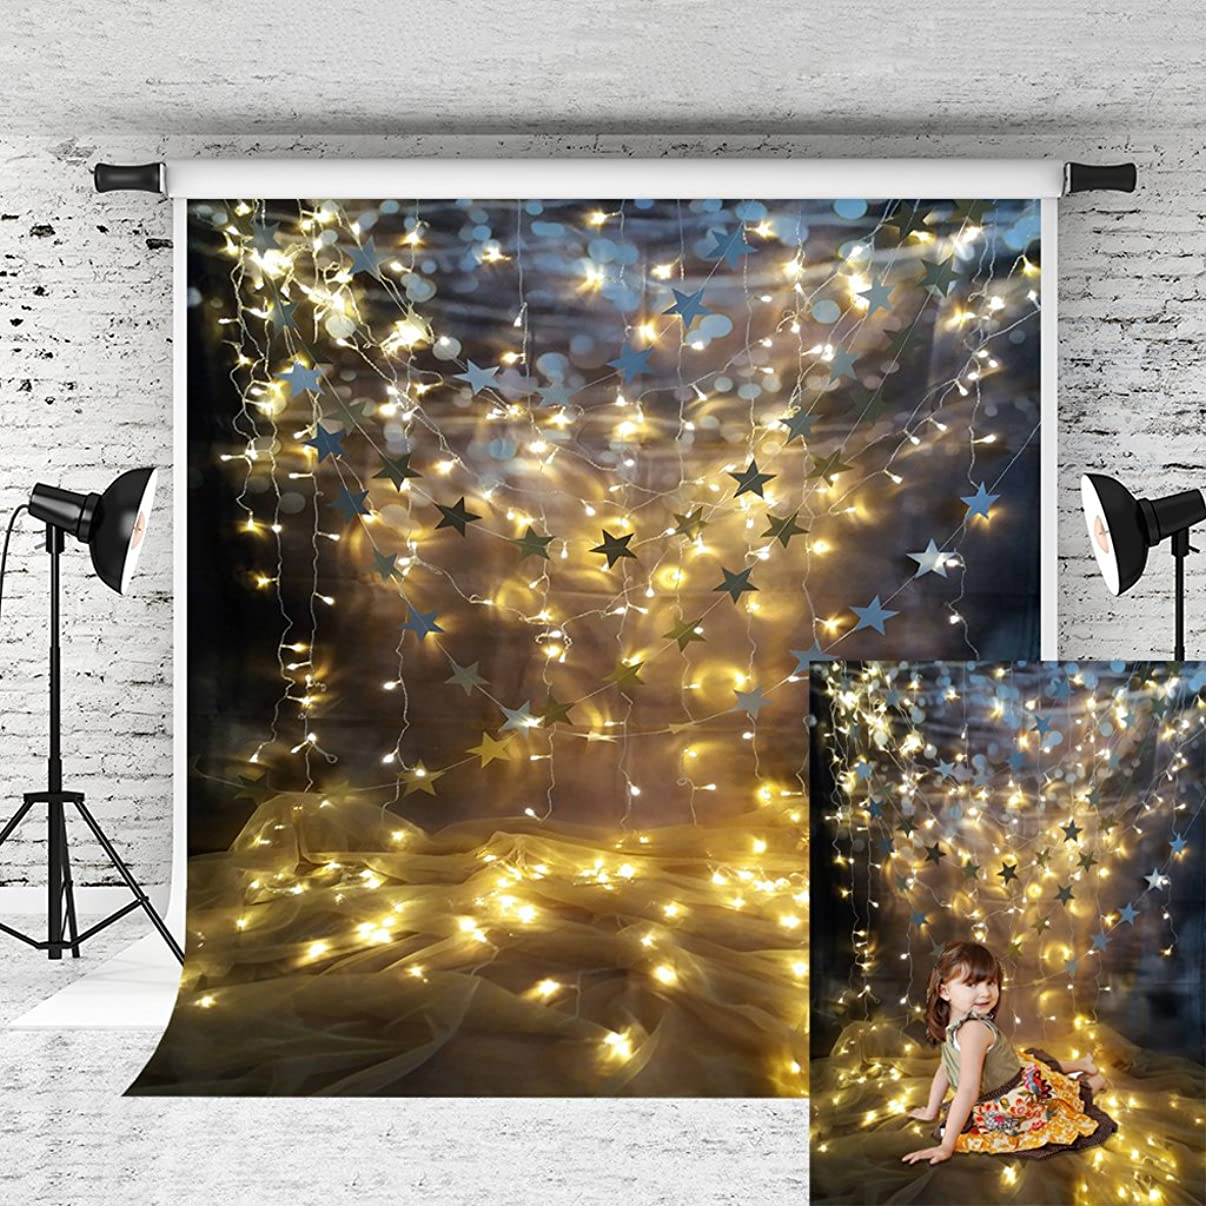 Kate 6.5x10ft Shimmer Star Backdrop Golden Lighting Glitter Photography Background for Children Wedding Photo Studio Prop